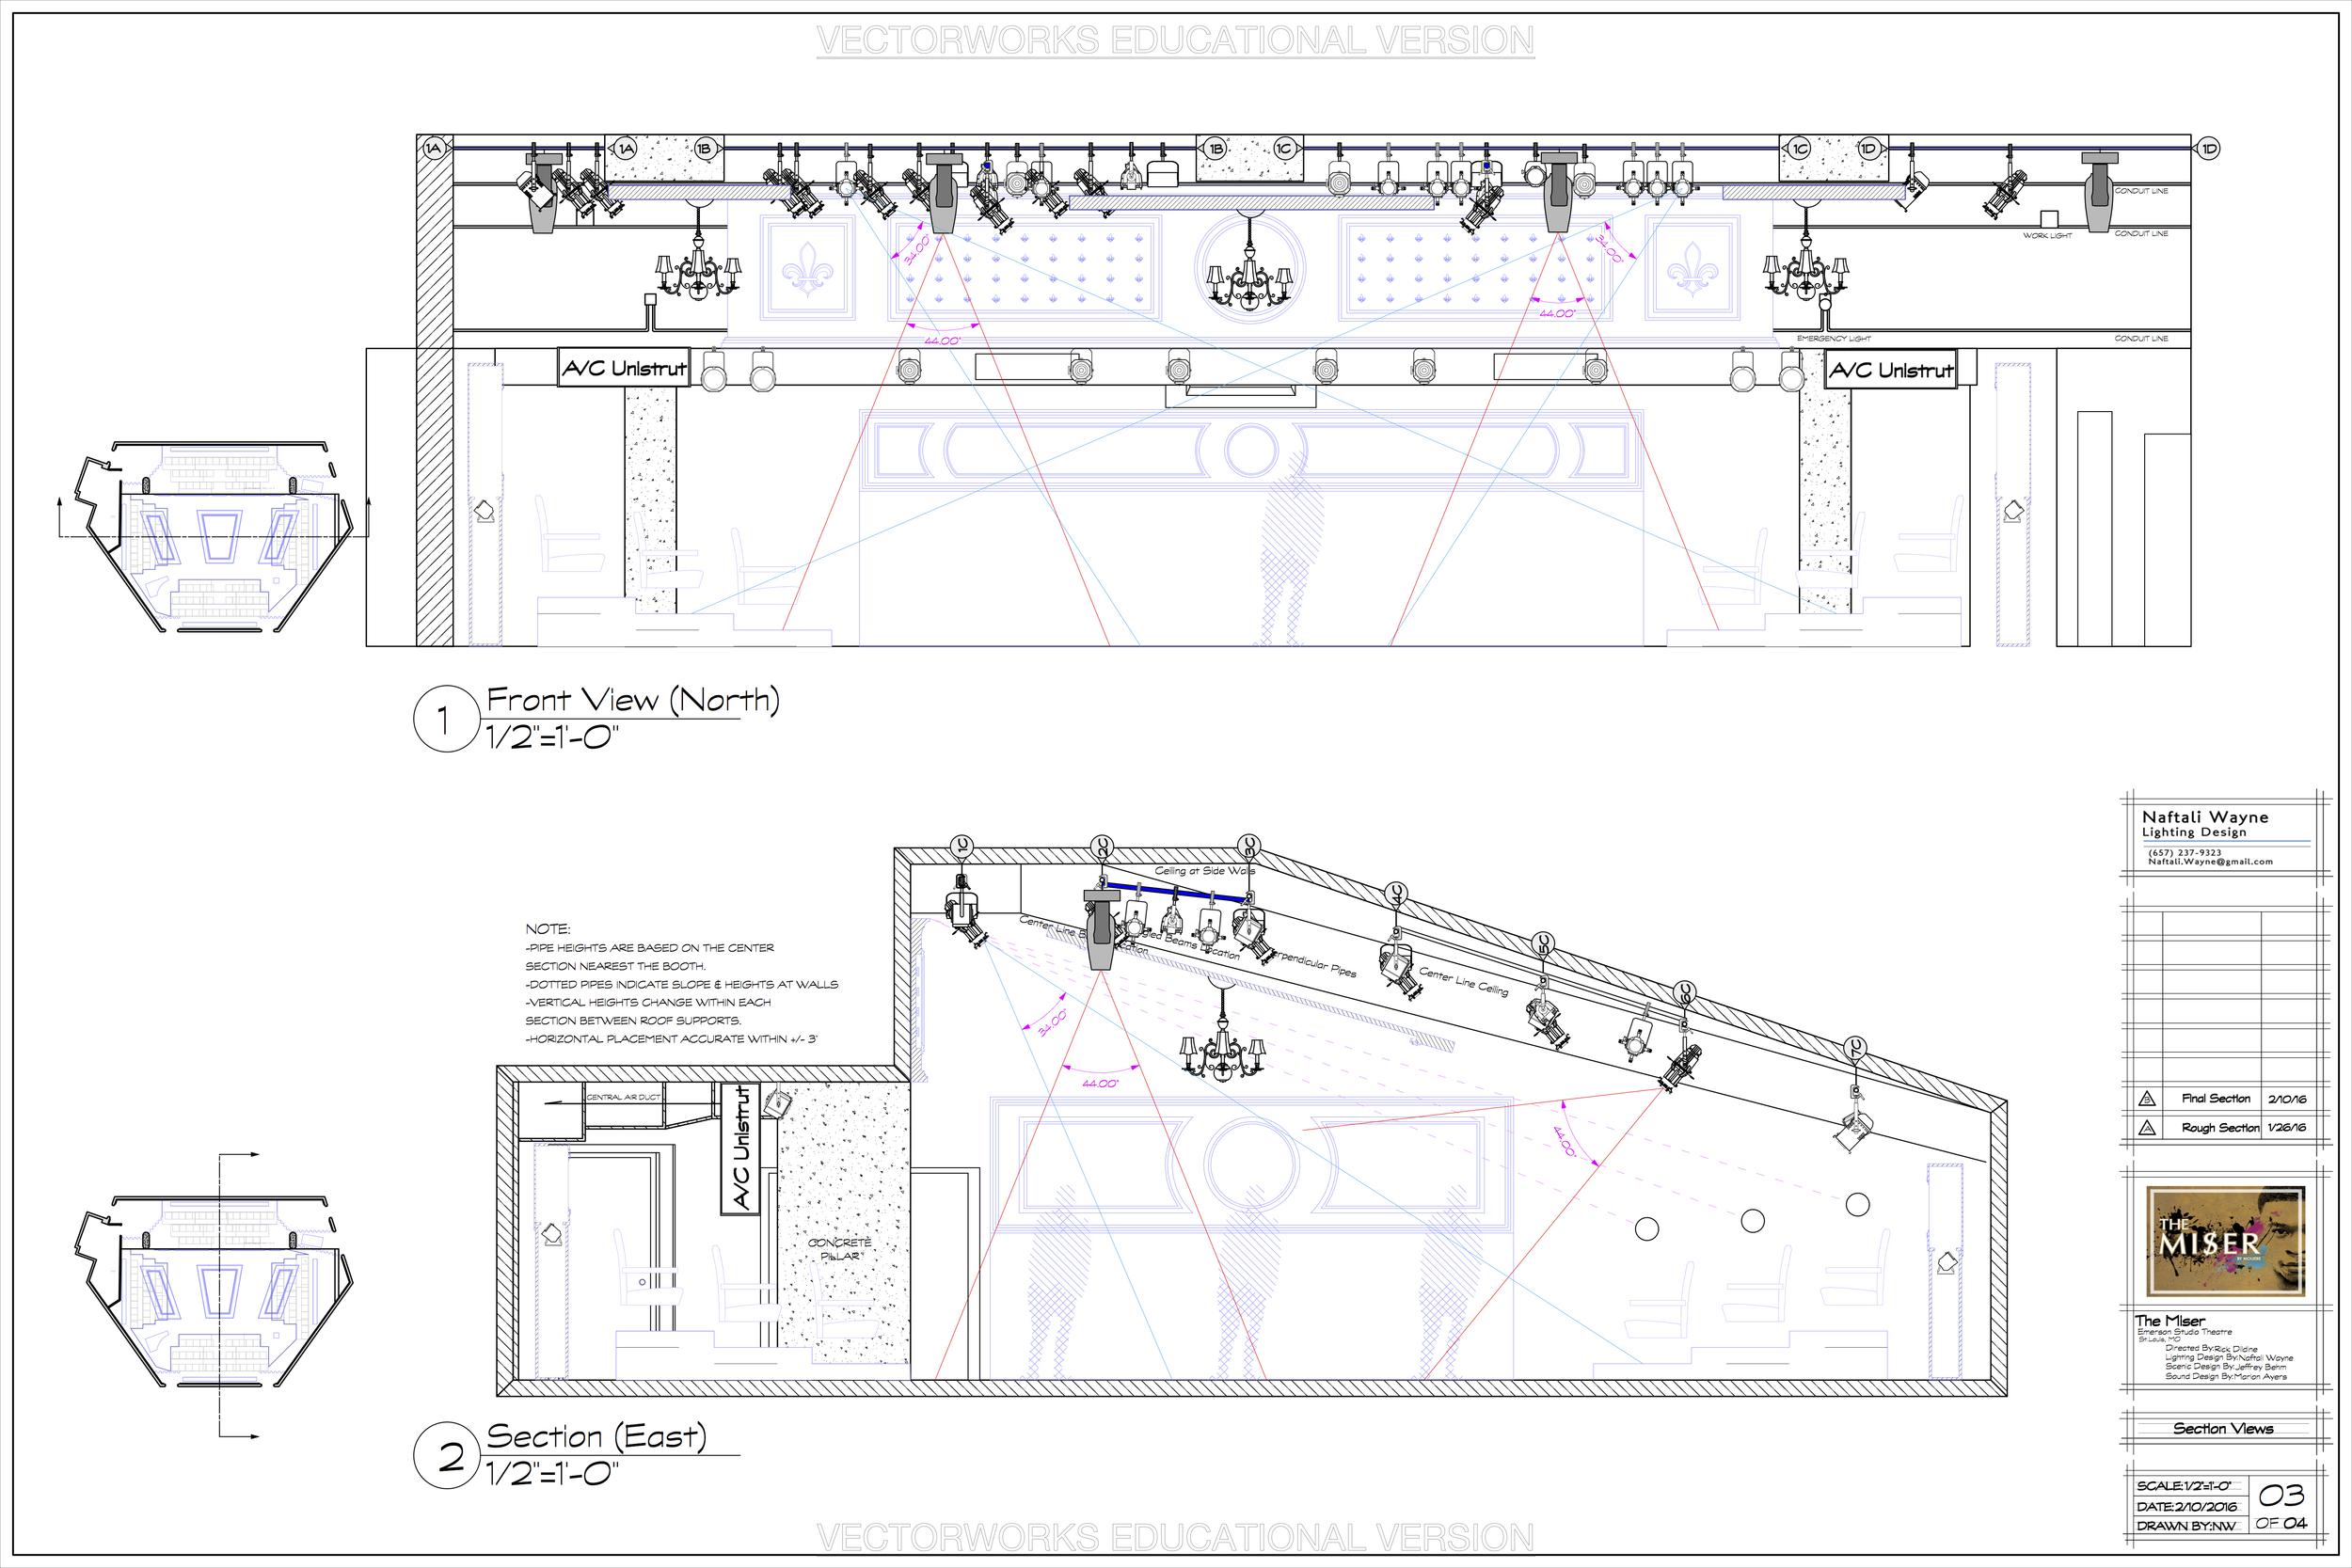 Section Views - The Miser - Emerson Studio Theatre - St. Louis MO